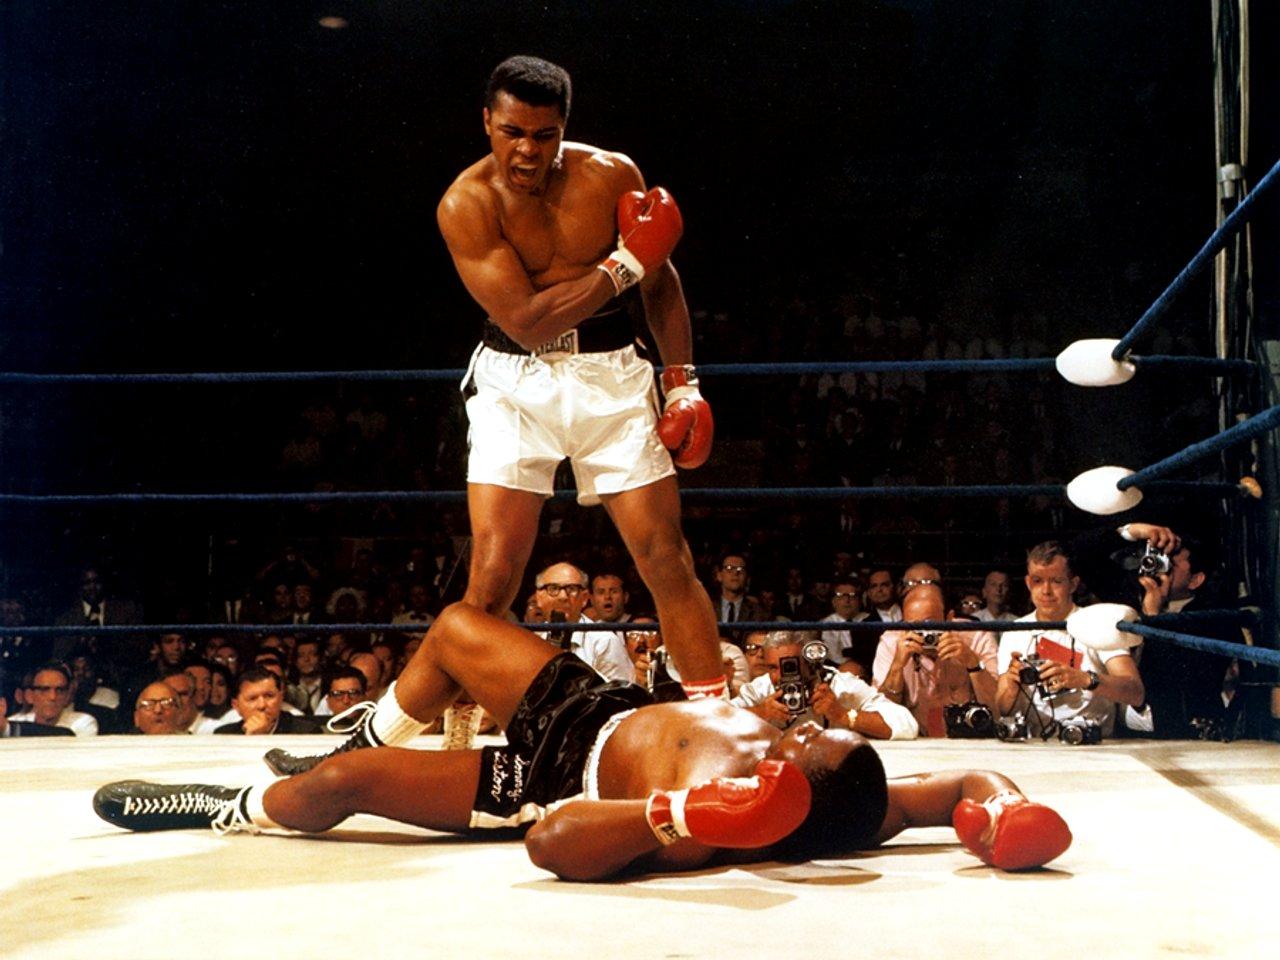 http://3.bp.blogspot.com/-Cq9TDSeub9s/UEsJizNUHfI/AAAAAAAADT8/E-ZH29R_8fk/s1600/Boxing-1.jpg